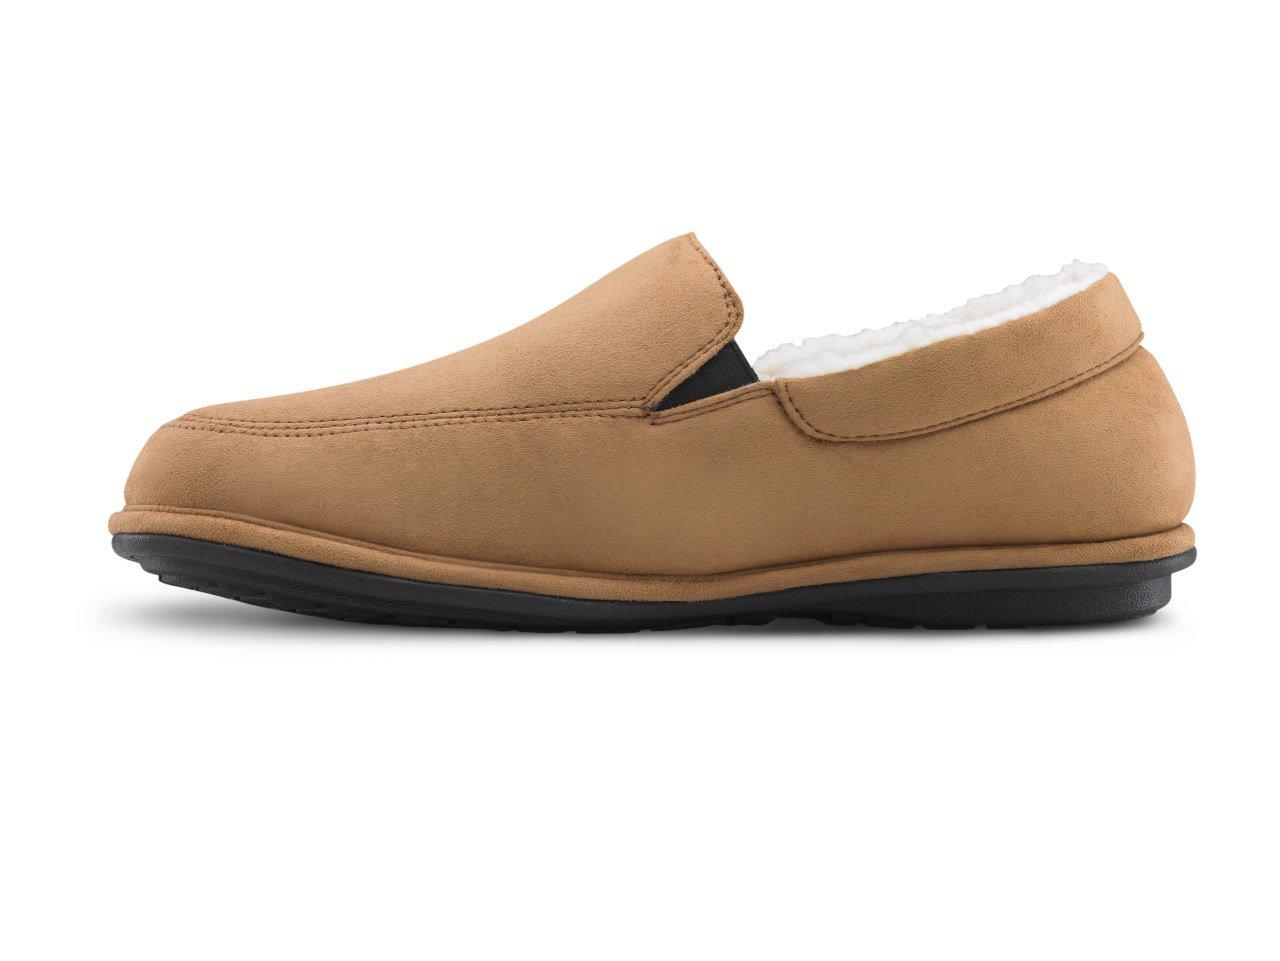 Dr. Comfort Relax Men's Slippers - Camel